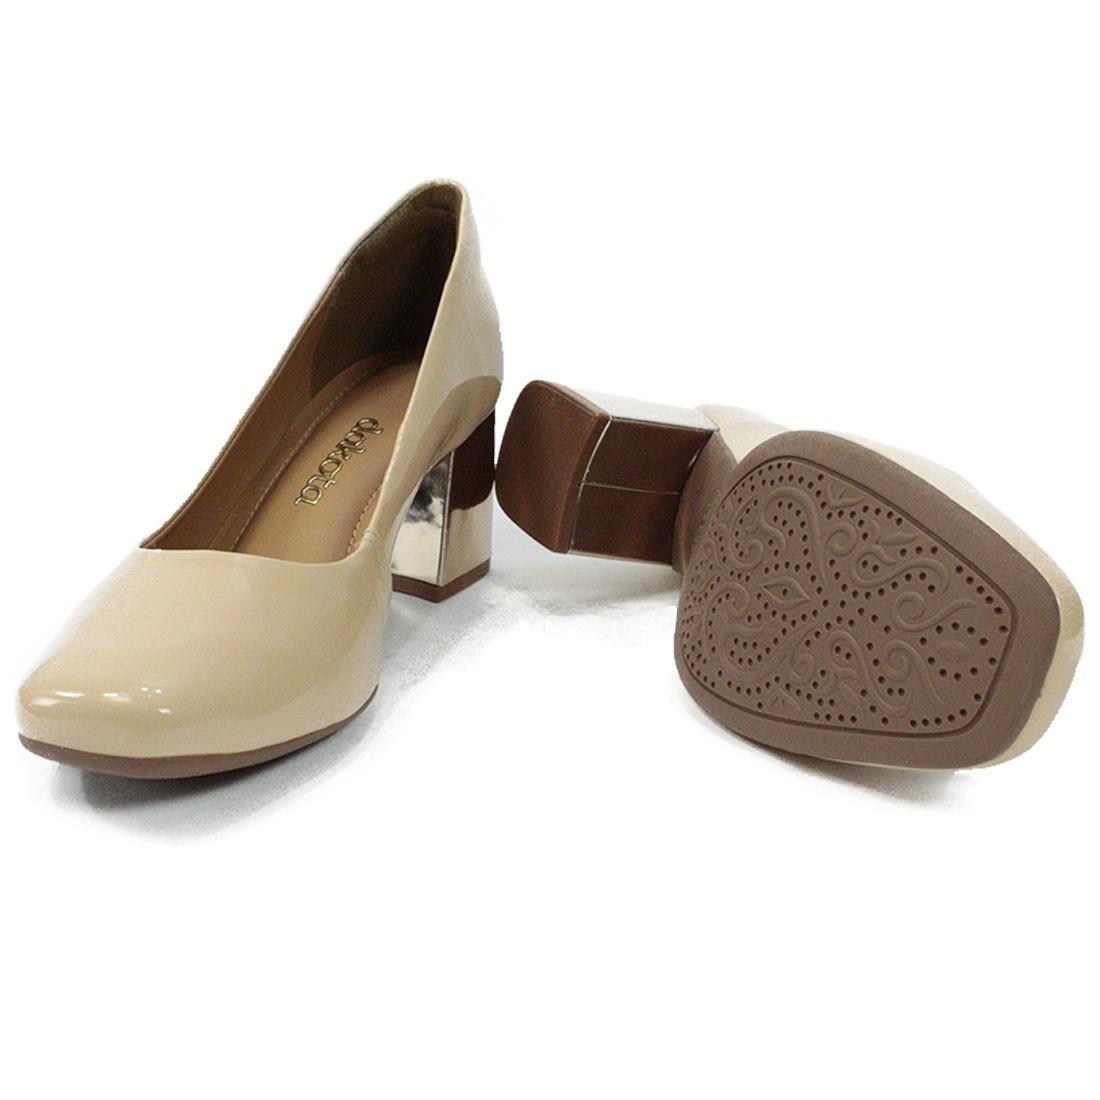 5d5e5922b Sapato Feminino Scarpin Dakota Salto Bloco Verniz - R$ 120,90 em ...